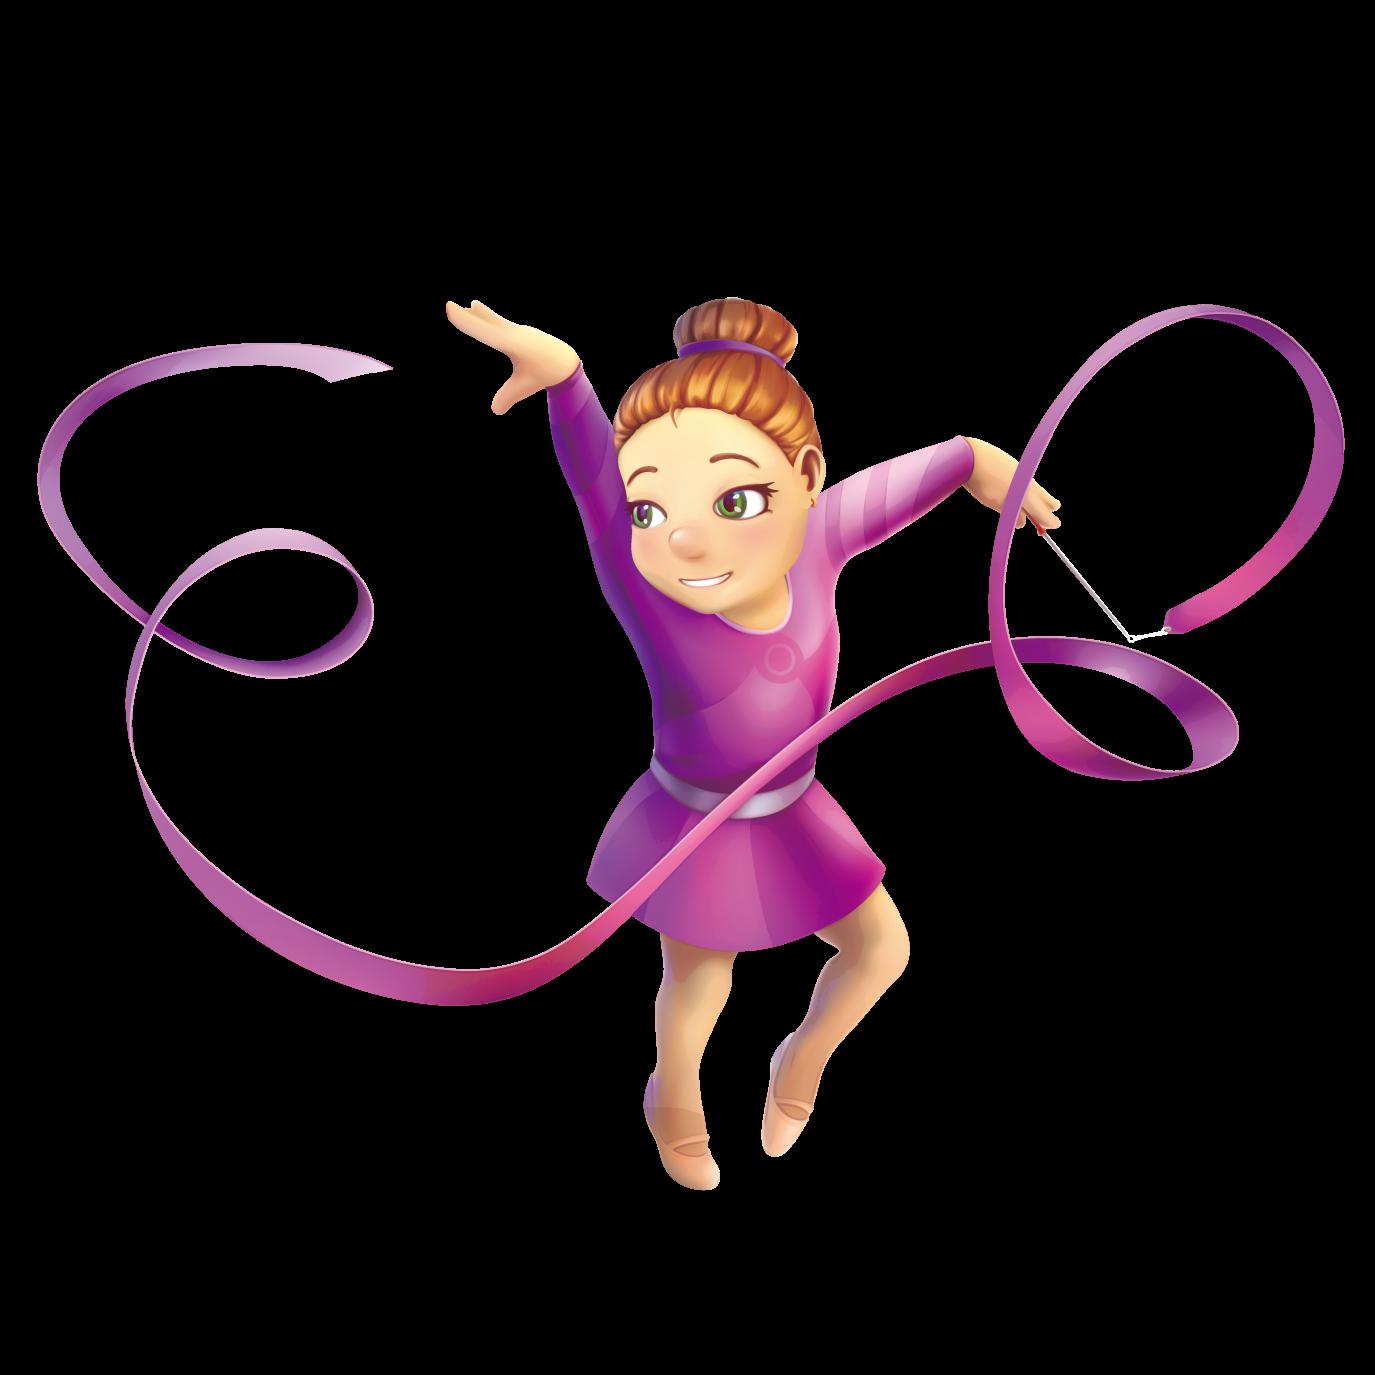 Purple clipart gymnastics. Rhythmic ribbon vector material